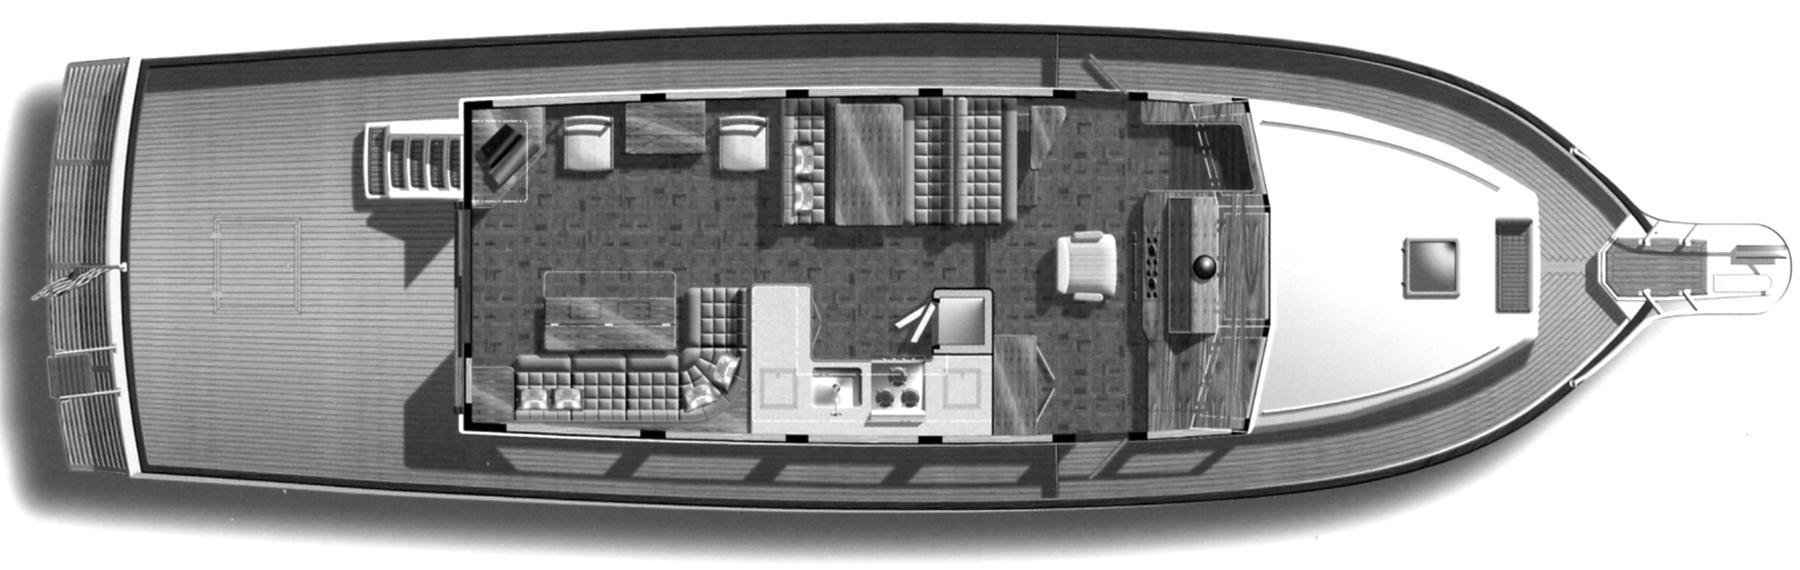 52 Europa Floor Plan 2